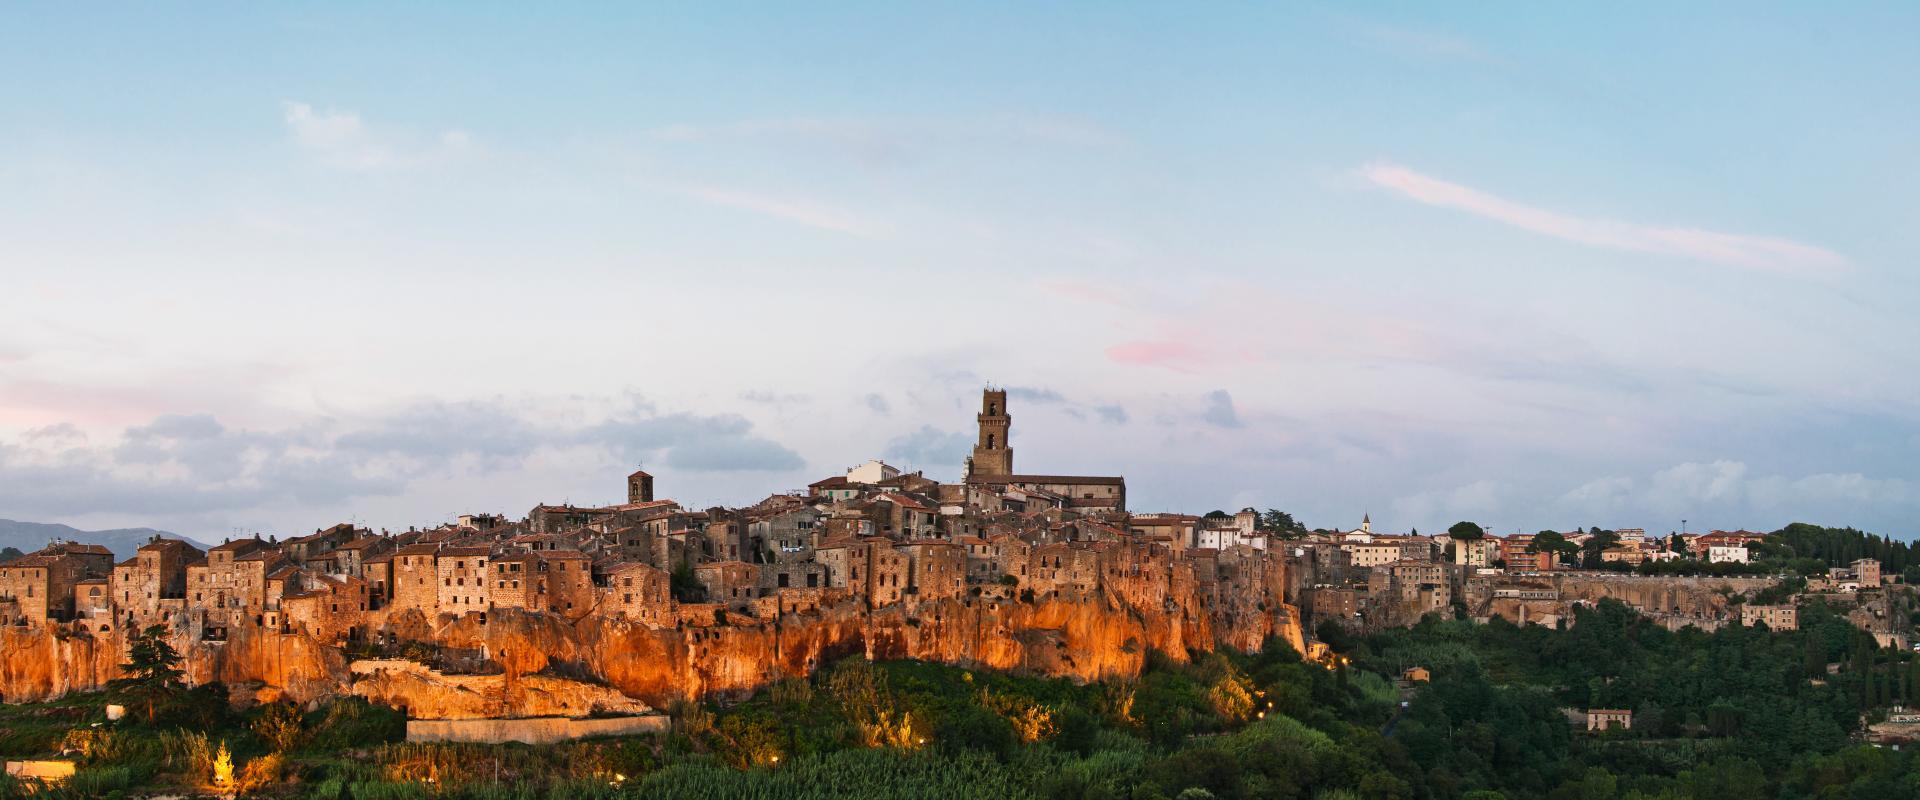 Pitigliano tuscany